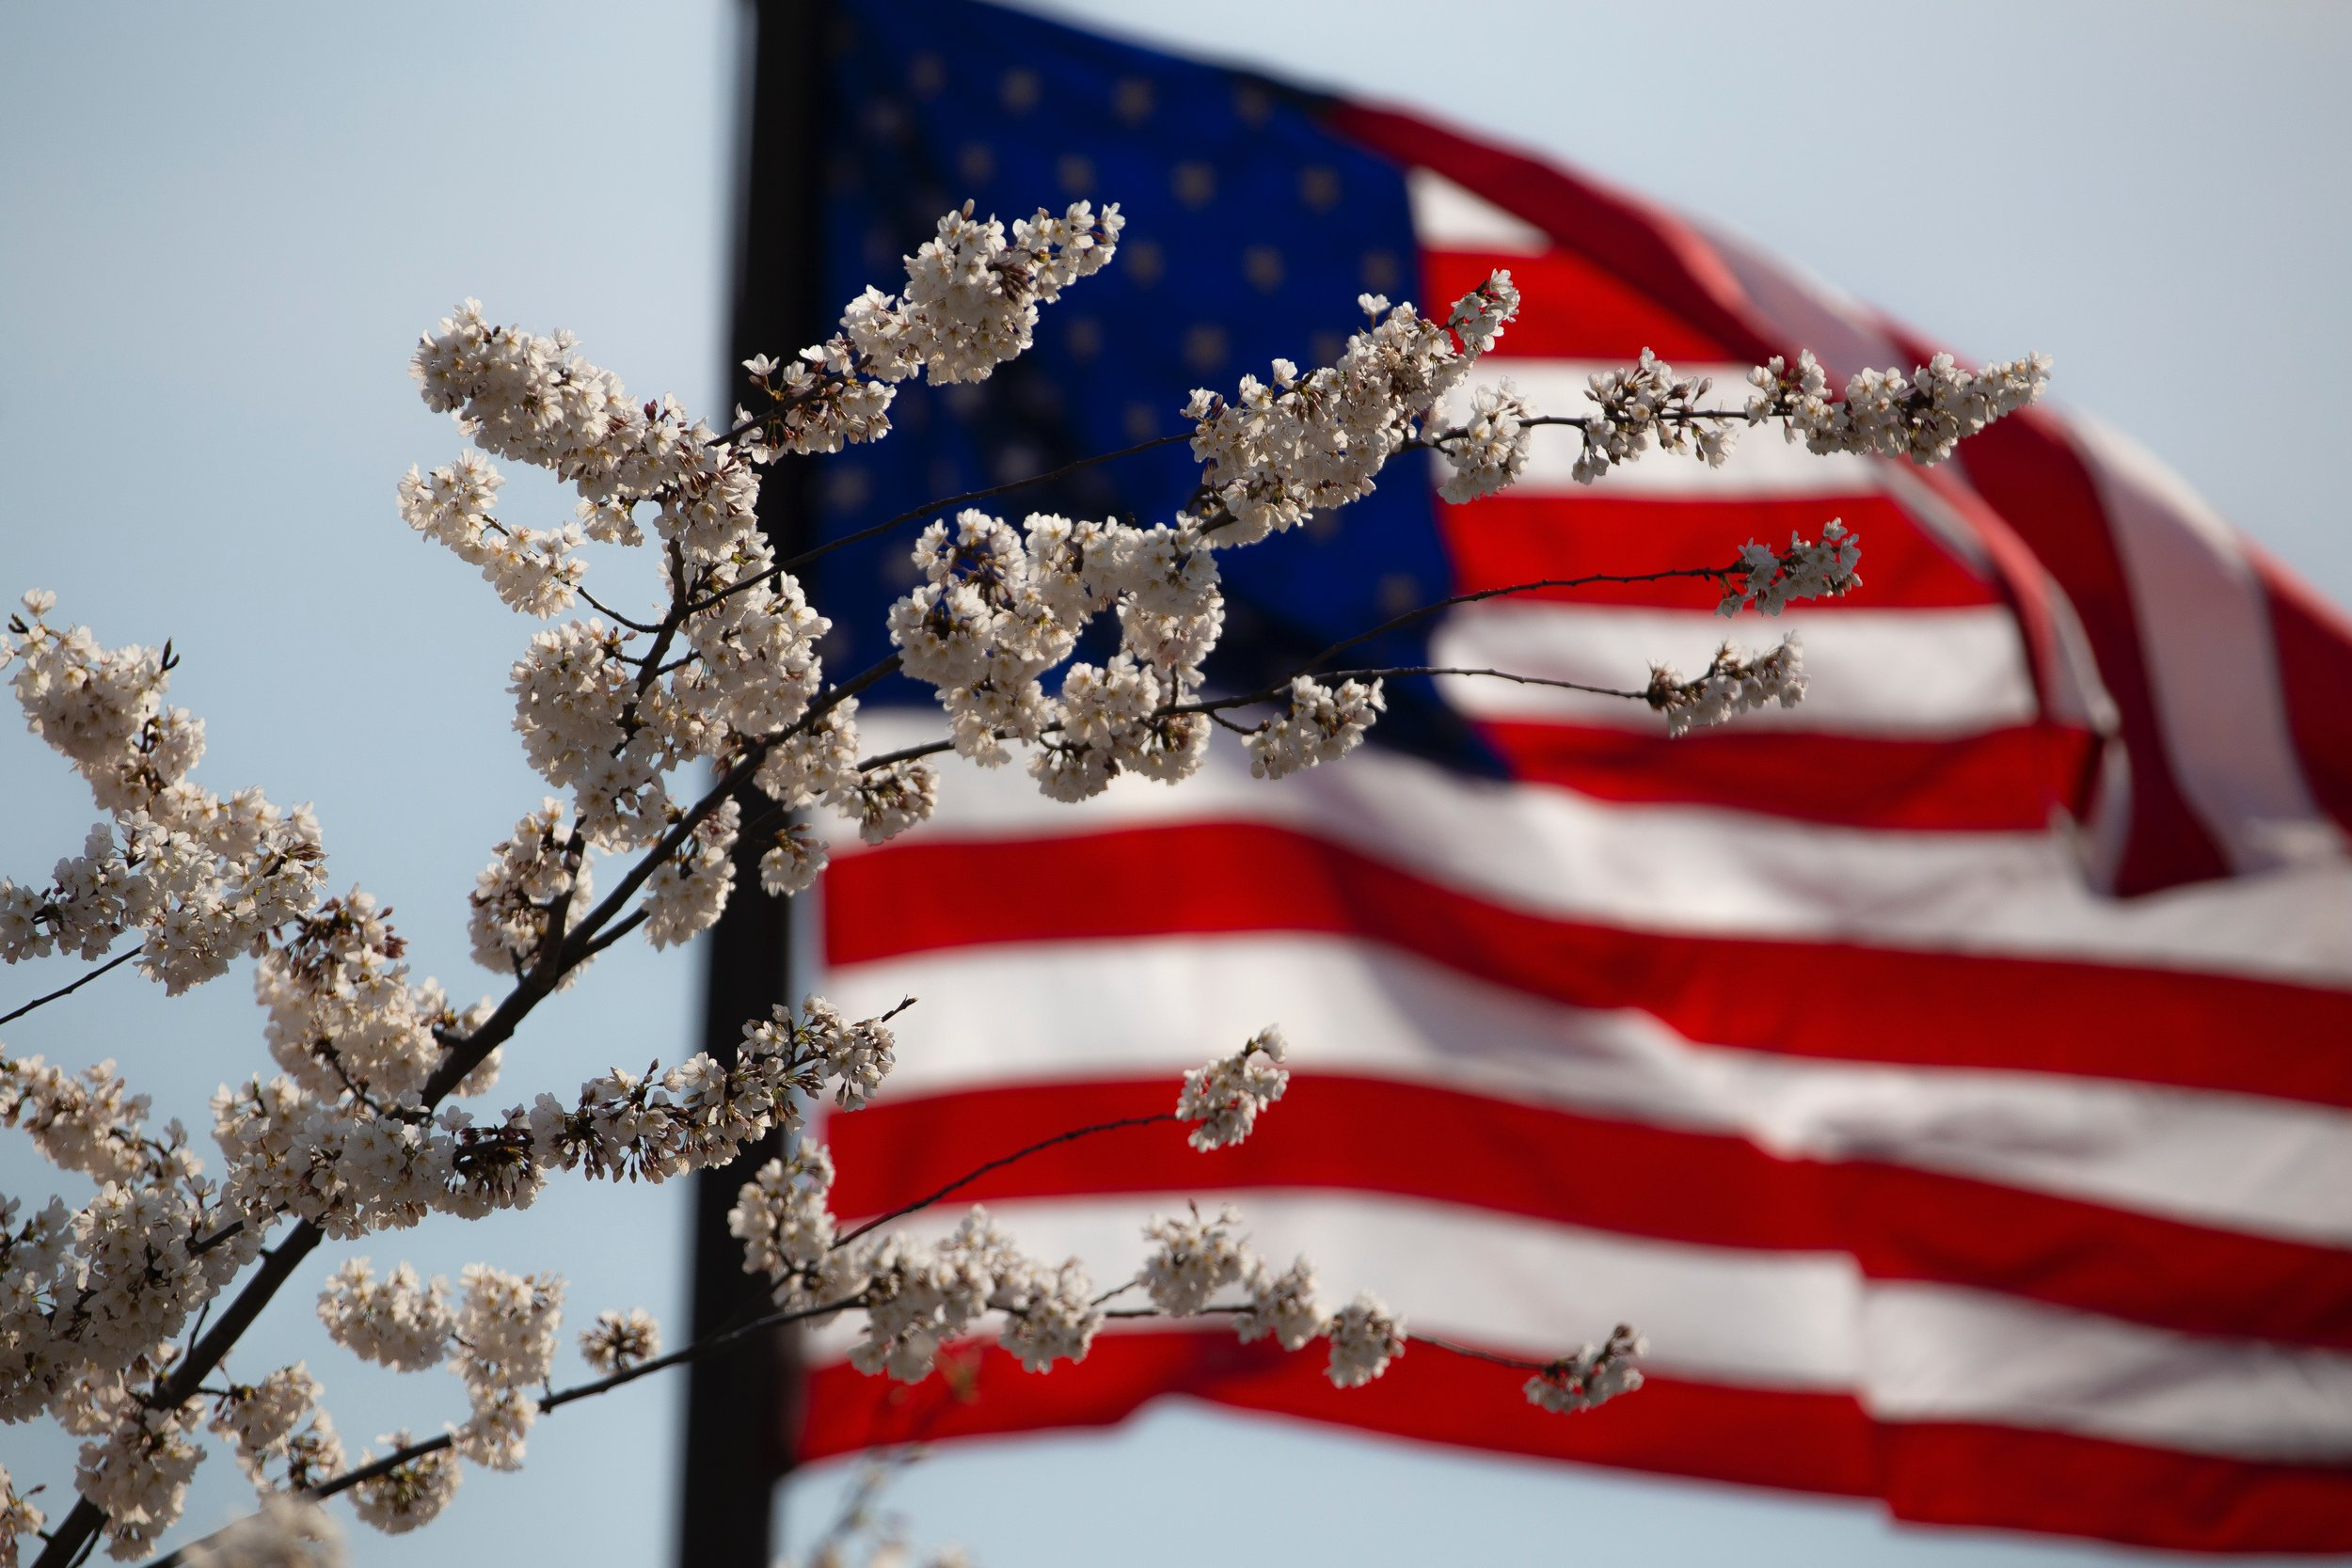 4th-of-july-american-flag-flag-1093645.jpg